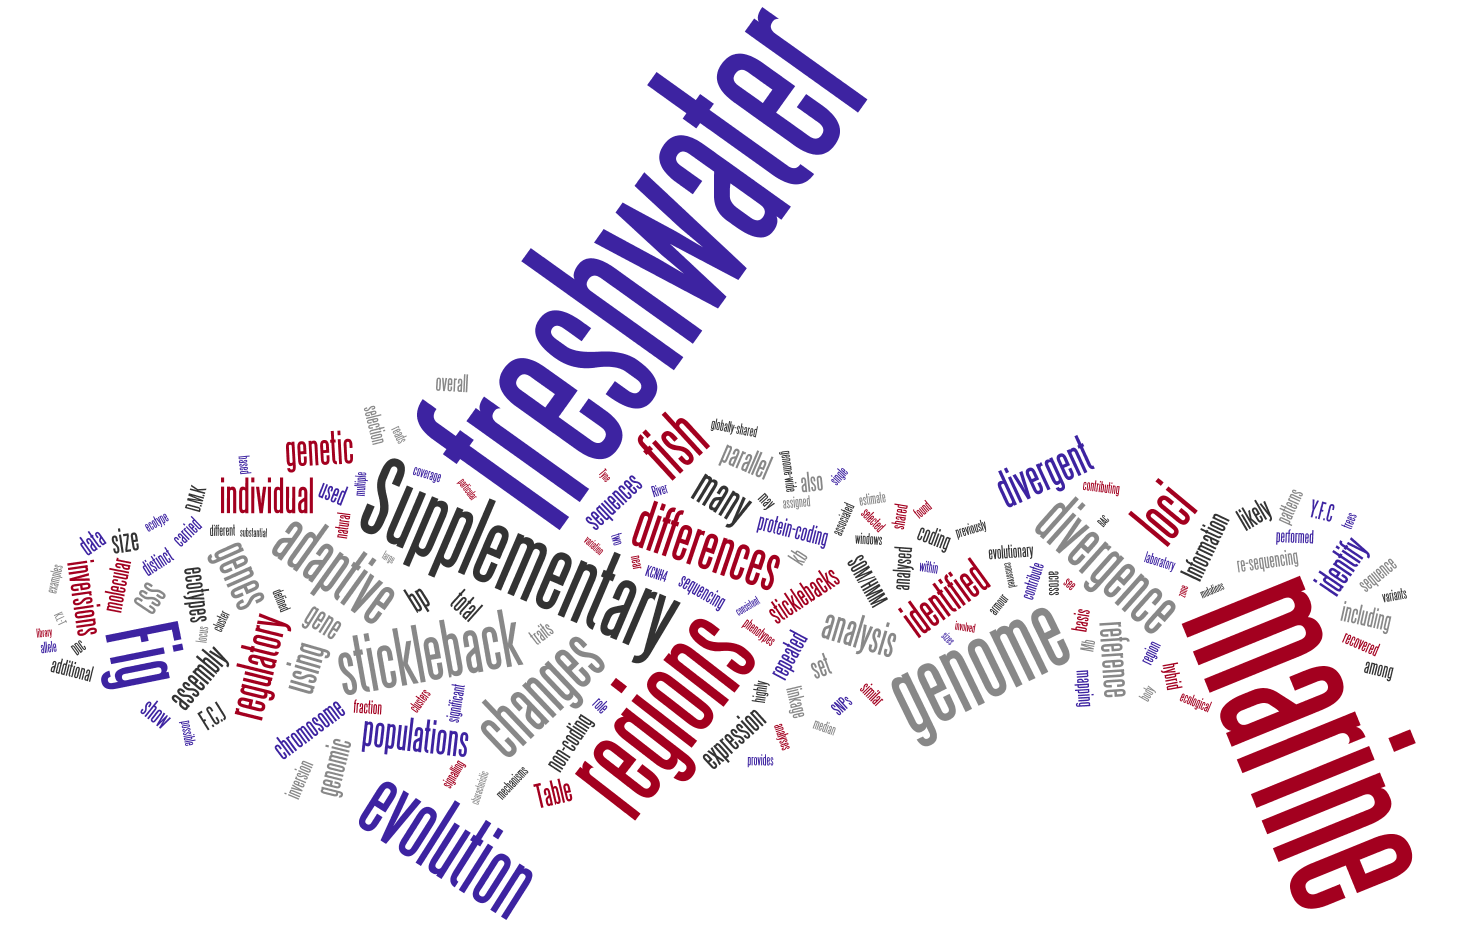 Stickleback Genome Wordle